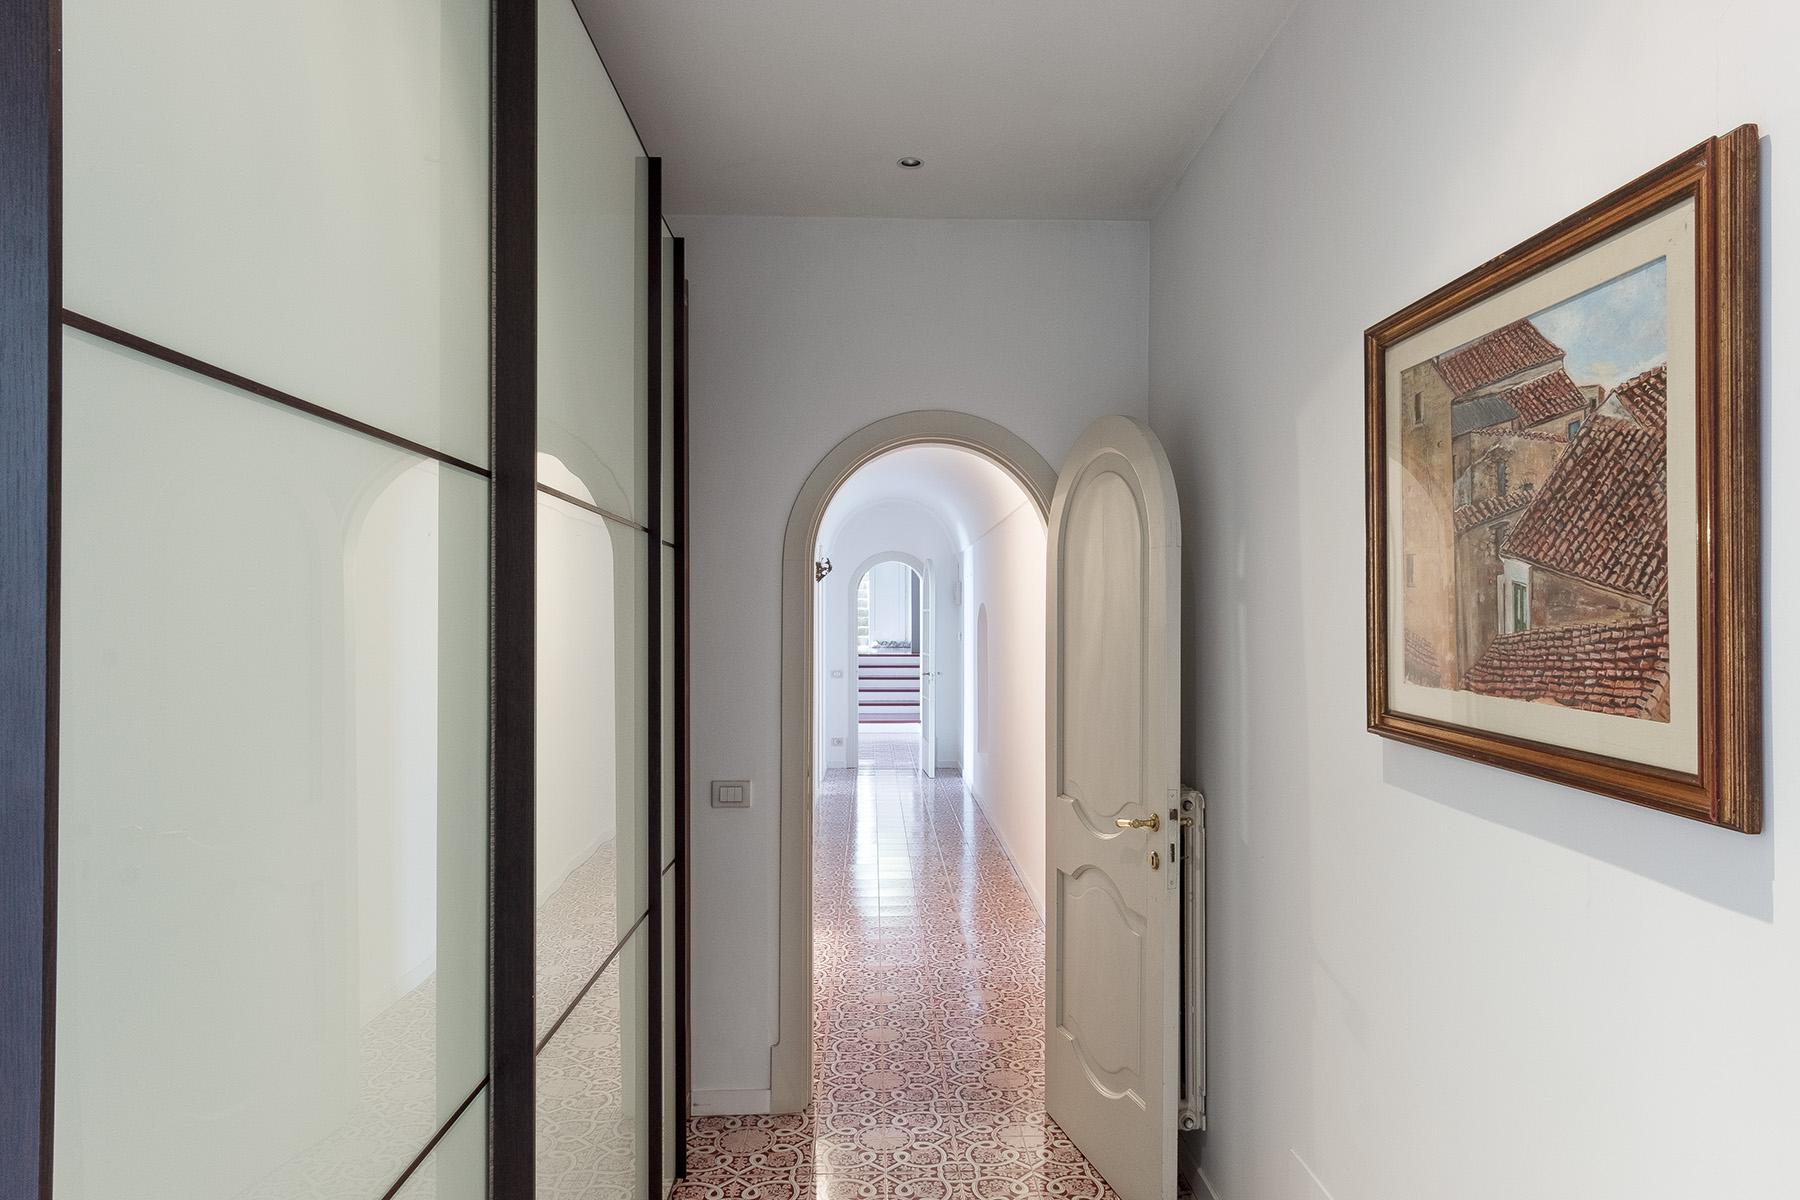 Casa indipendente in Vendita a Praiano: 4 locali, 250 mq - Foto 21